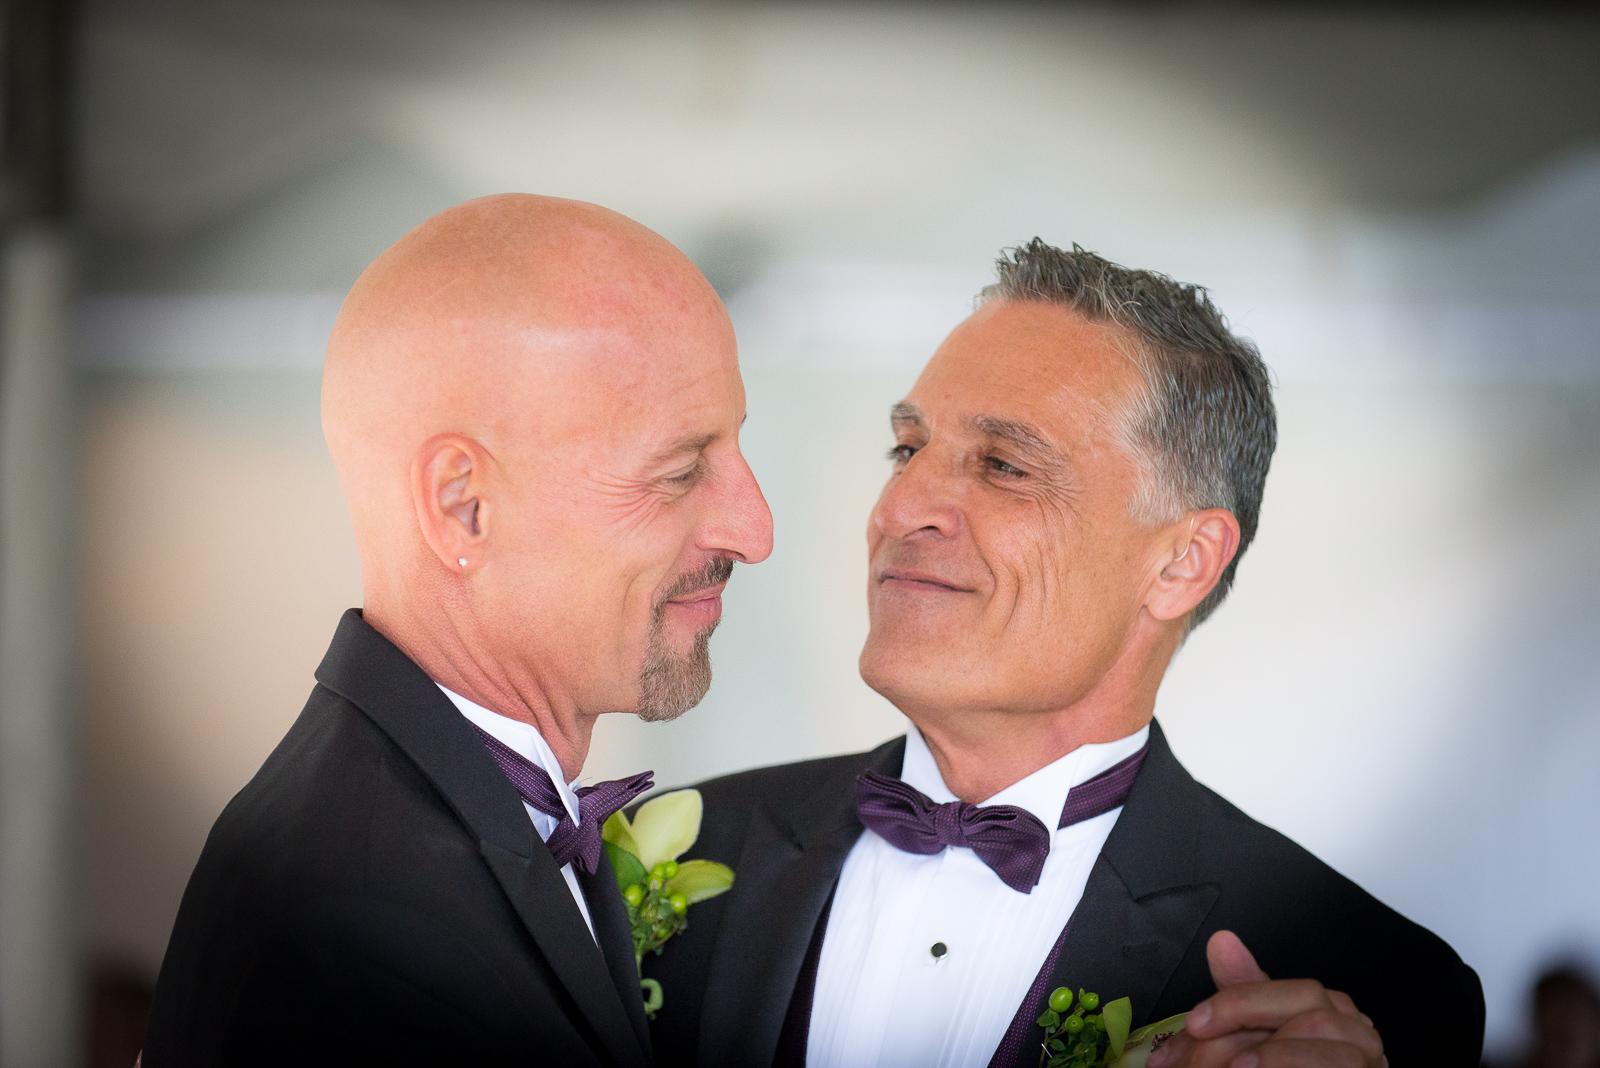 Michael-Napier-Weddings-Ludwig-Guilbeau Wedding-20 (32).jpg